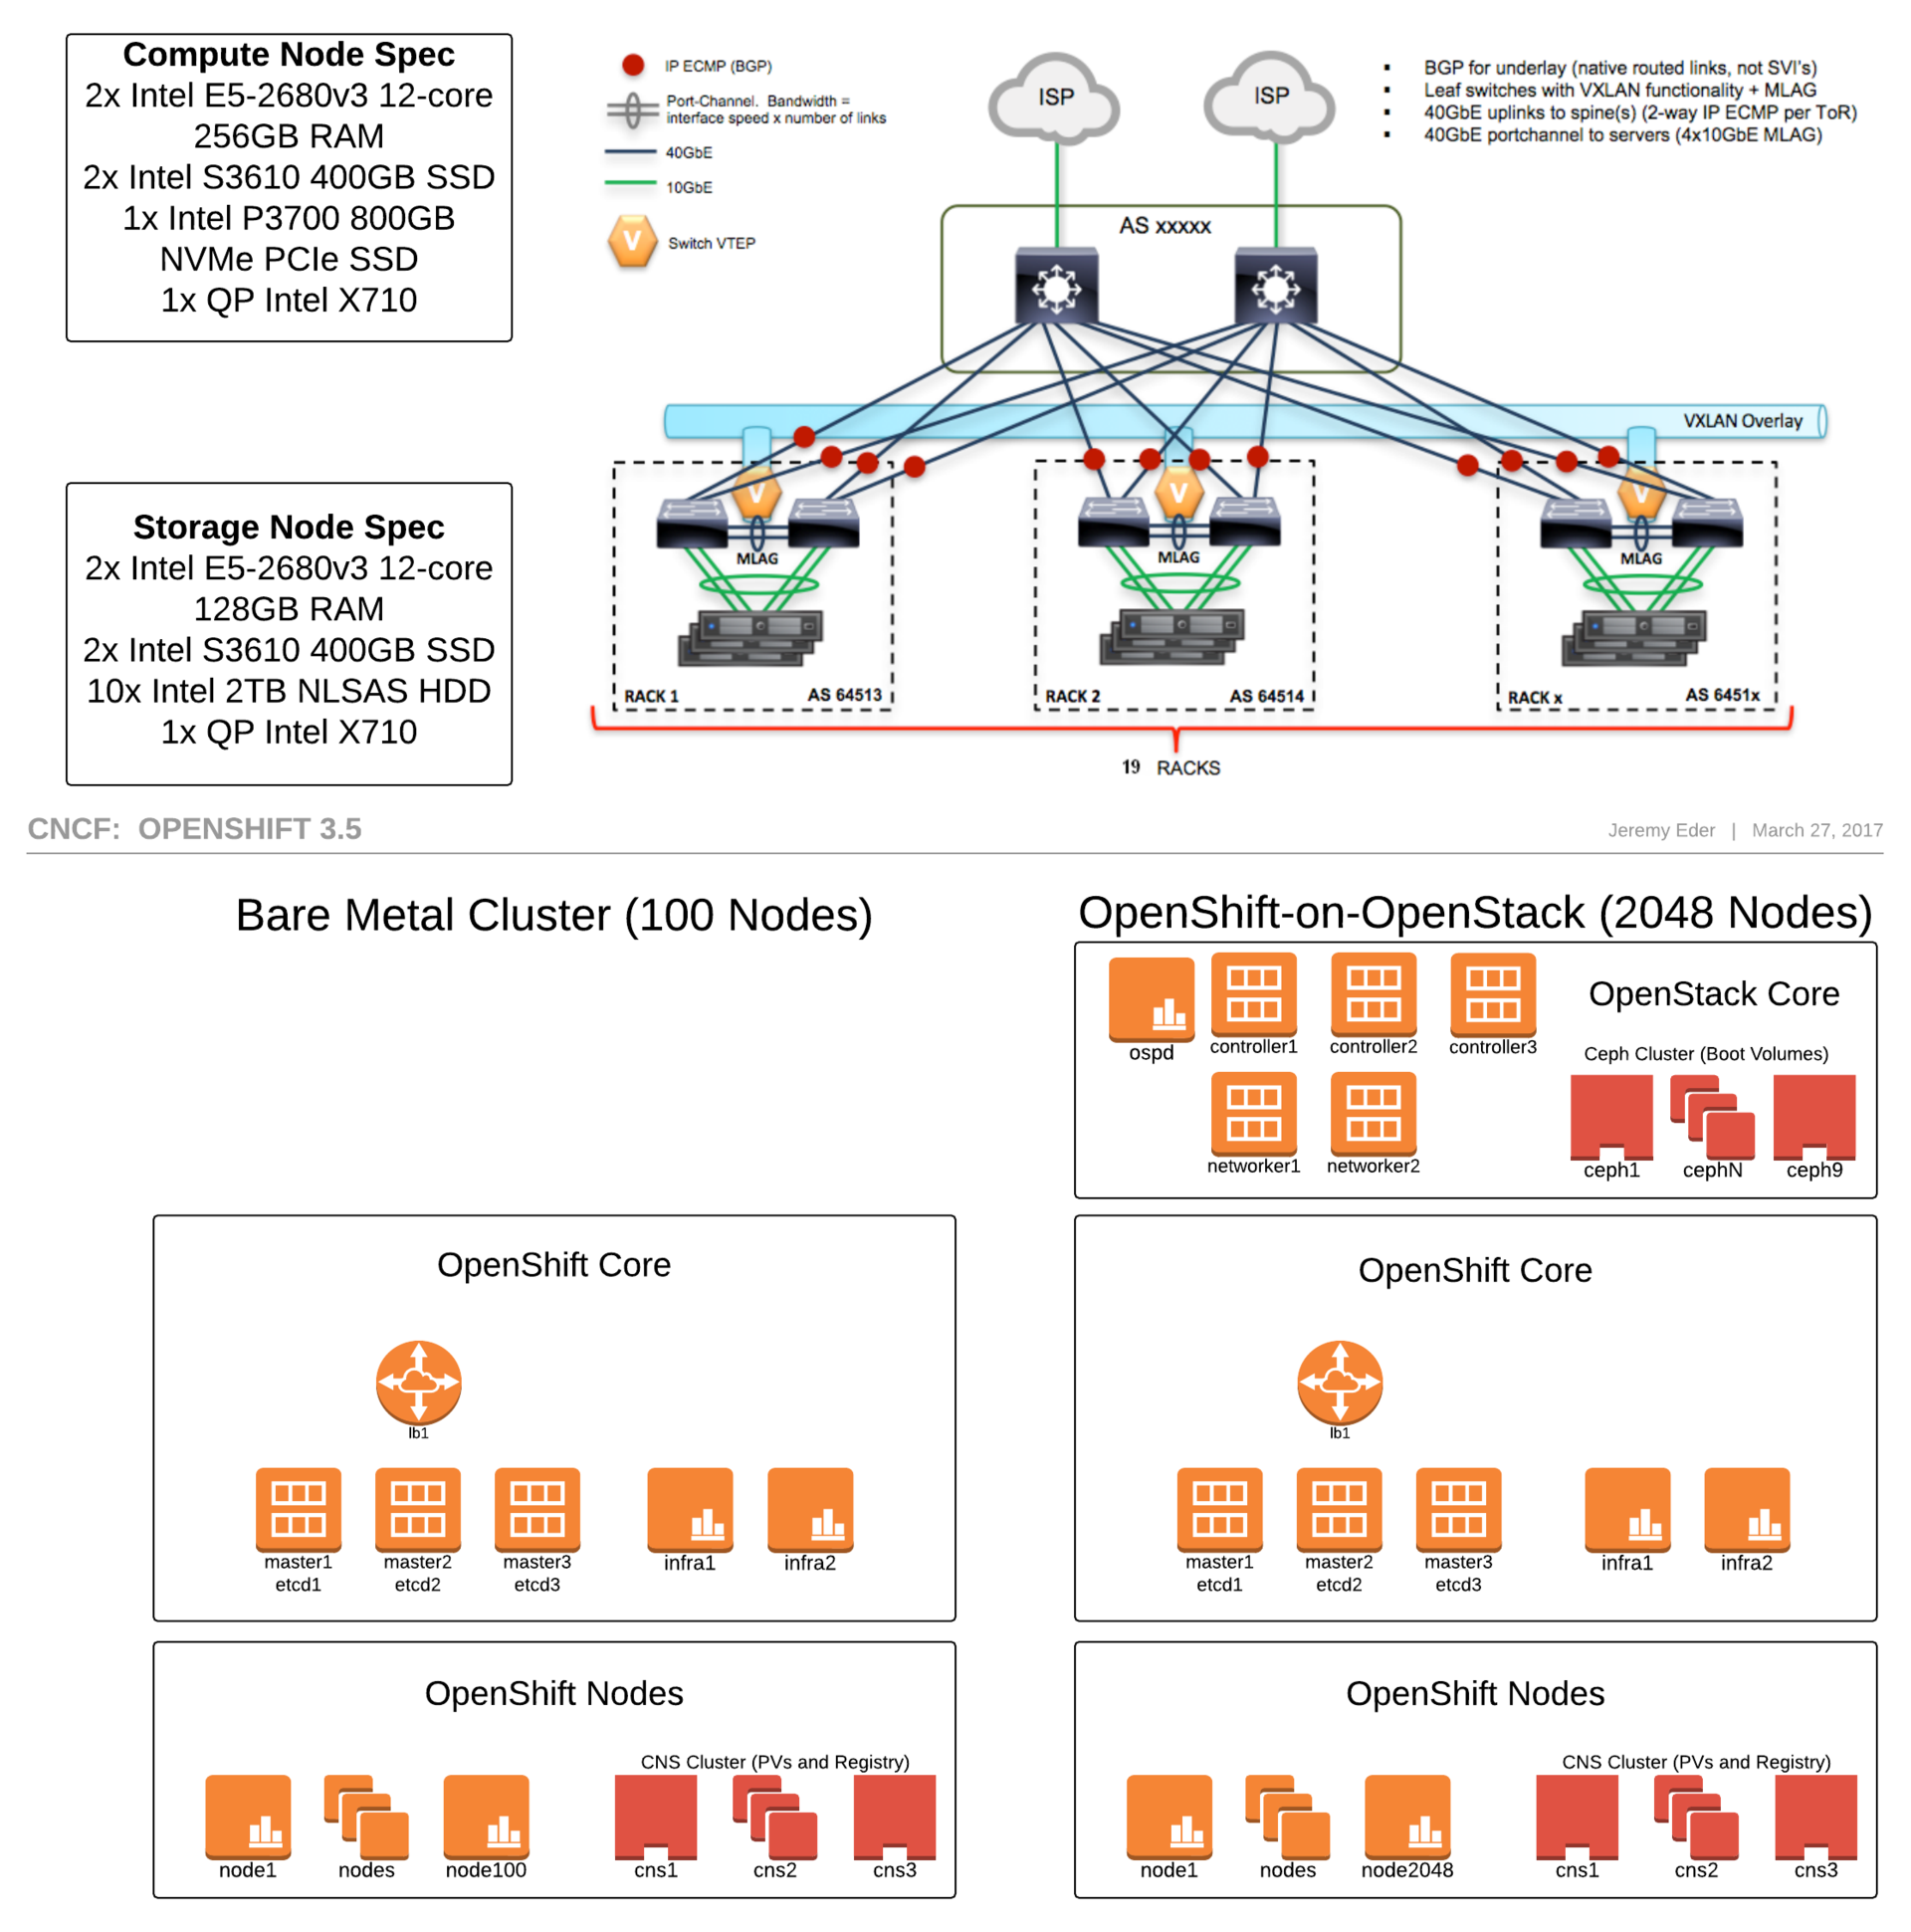 CNCF предложила бесплатное облако Open Source-проектам для DevOps-микросервисов - 3